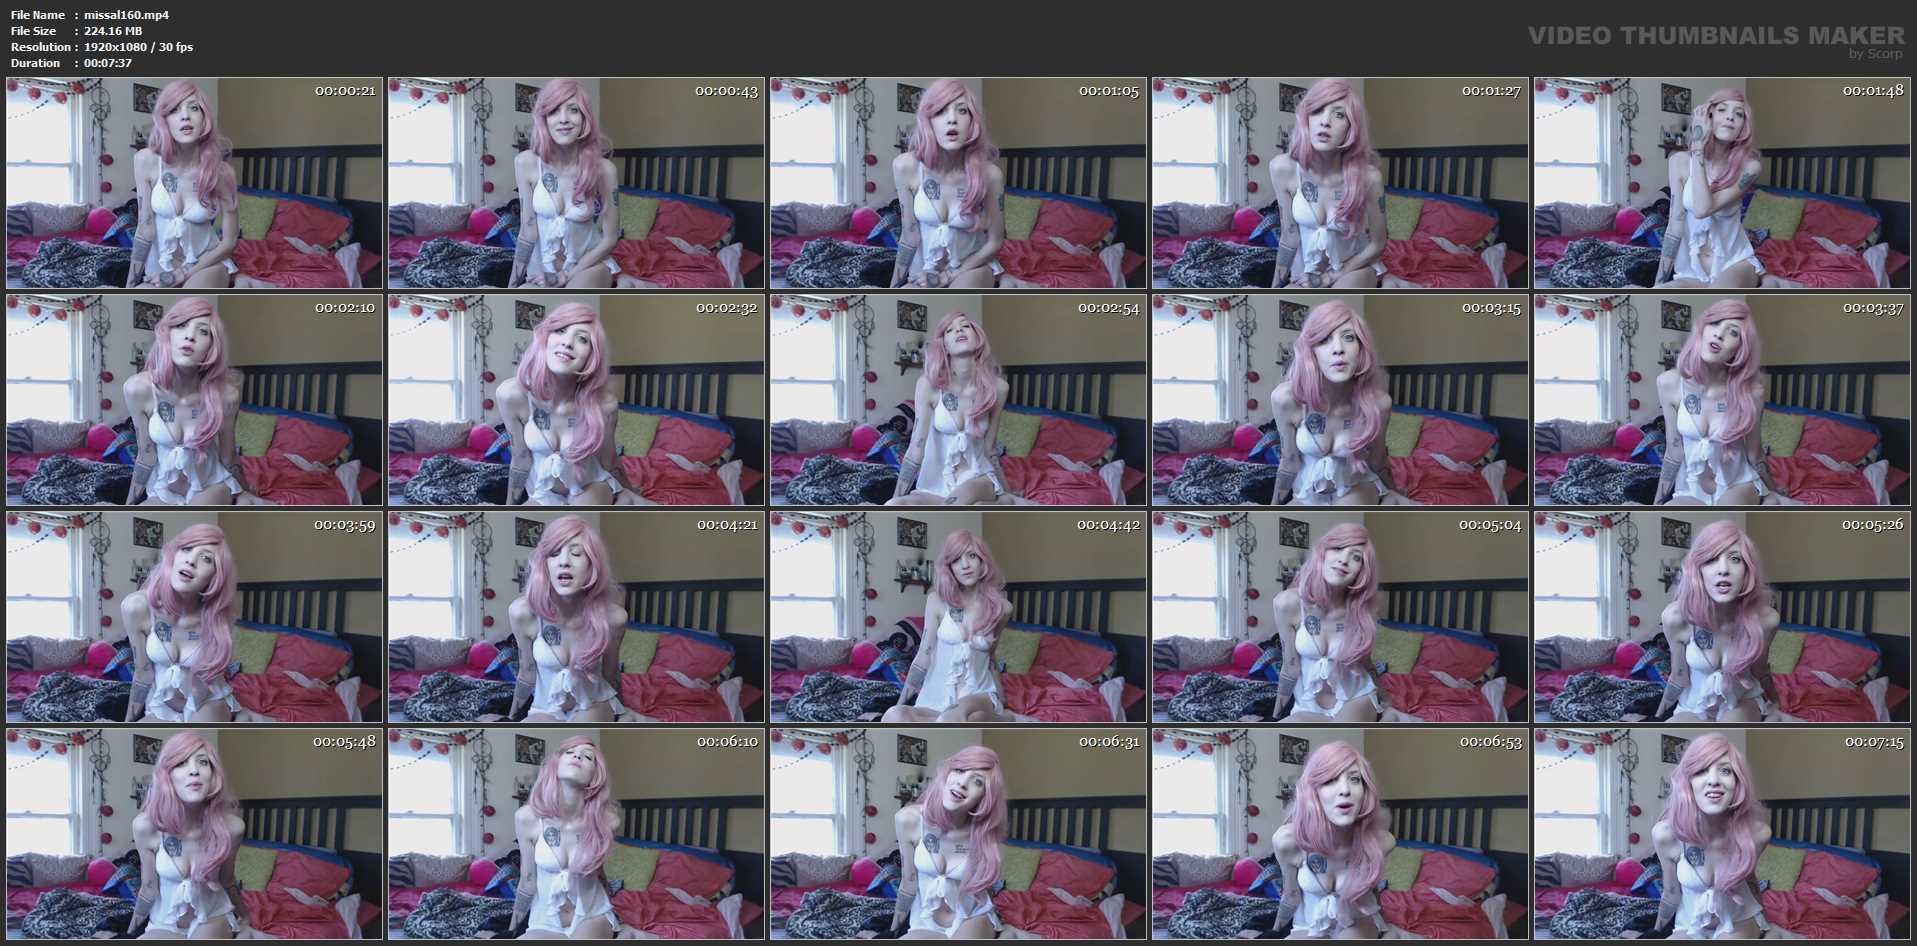 Mistress Salem In Scene: A.I. Fembot Instructions for Males - MISTERSS SALEM - FULL HD/1080p/MP4